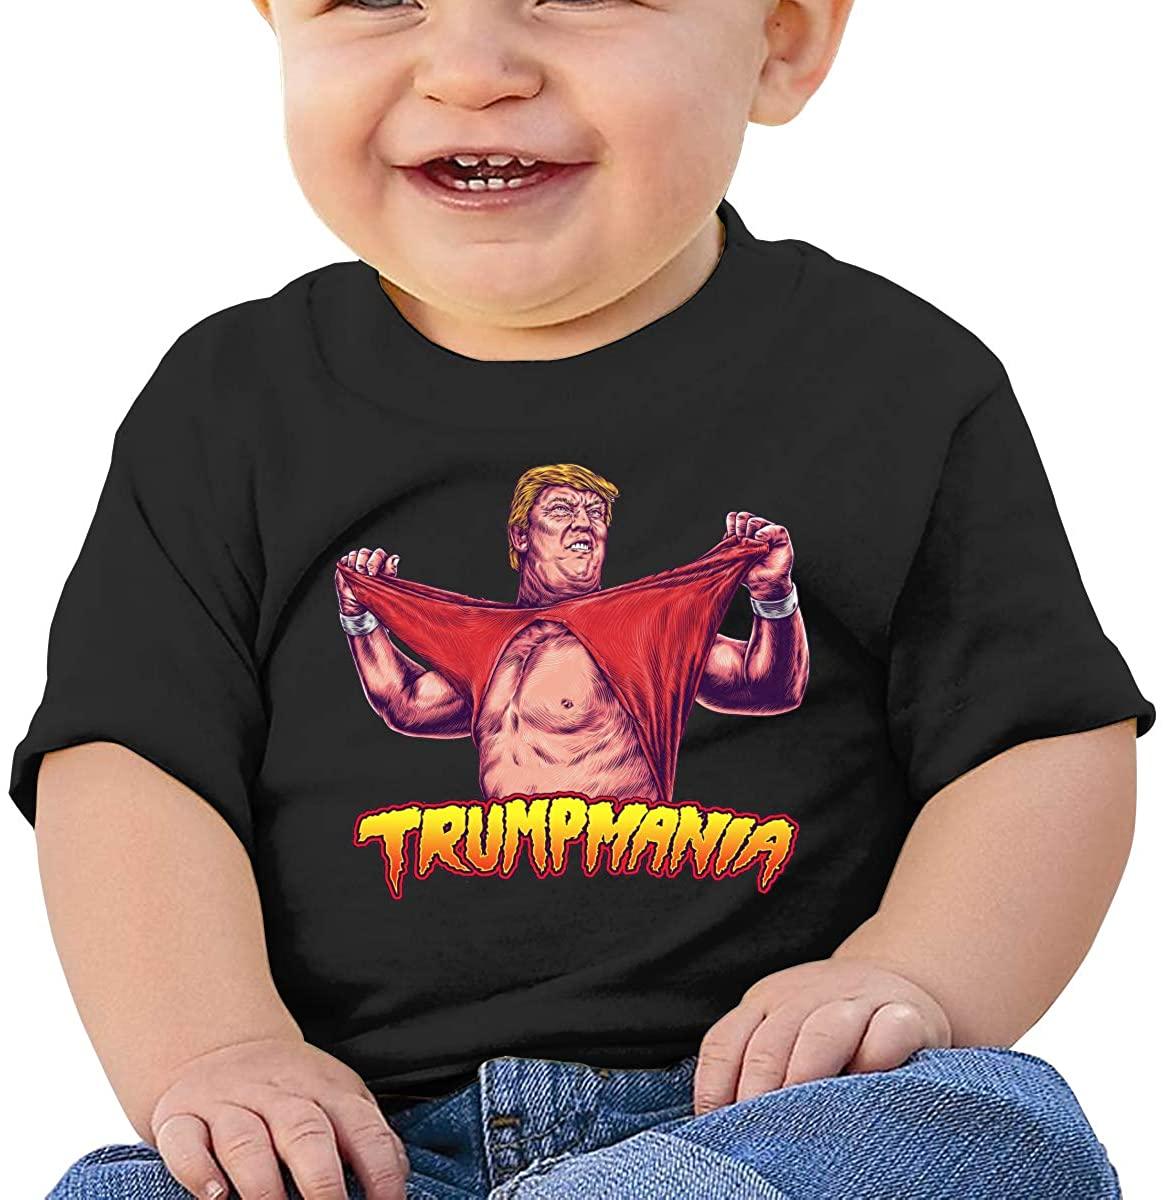 MNBVCXZ Baby Trump Amania 100% Cotton Jersey Short Sleeve Tee Boy Printed Tops